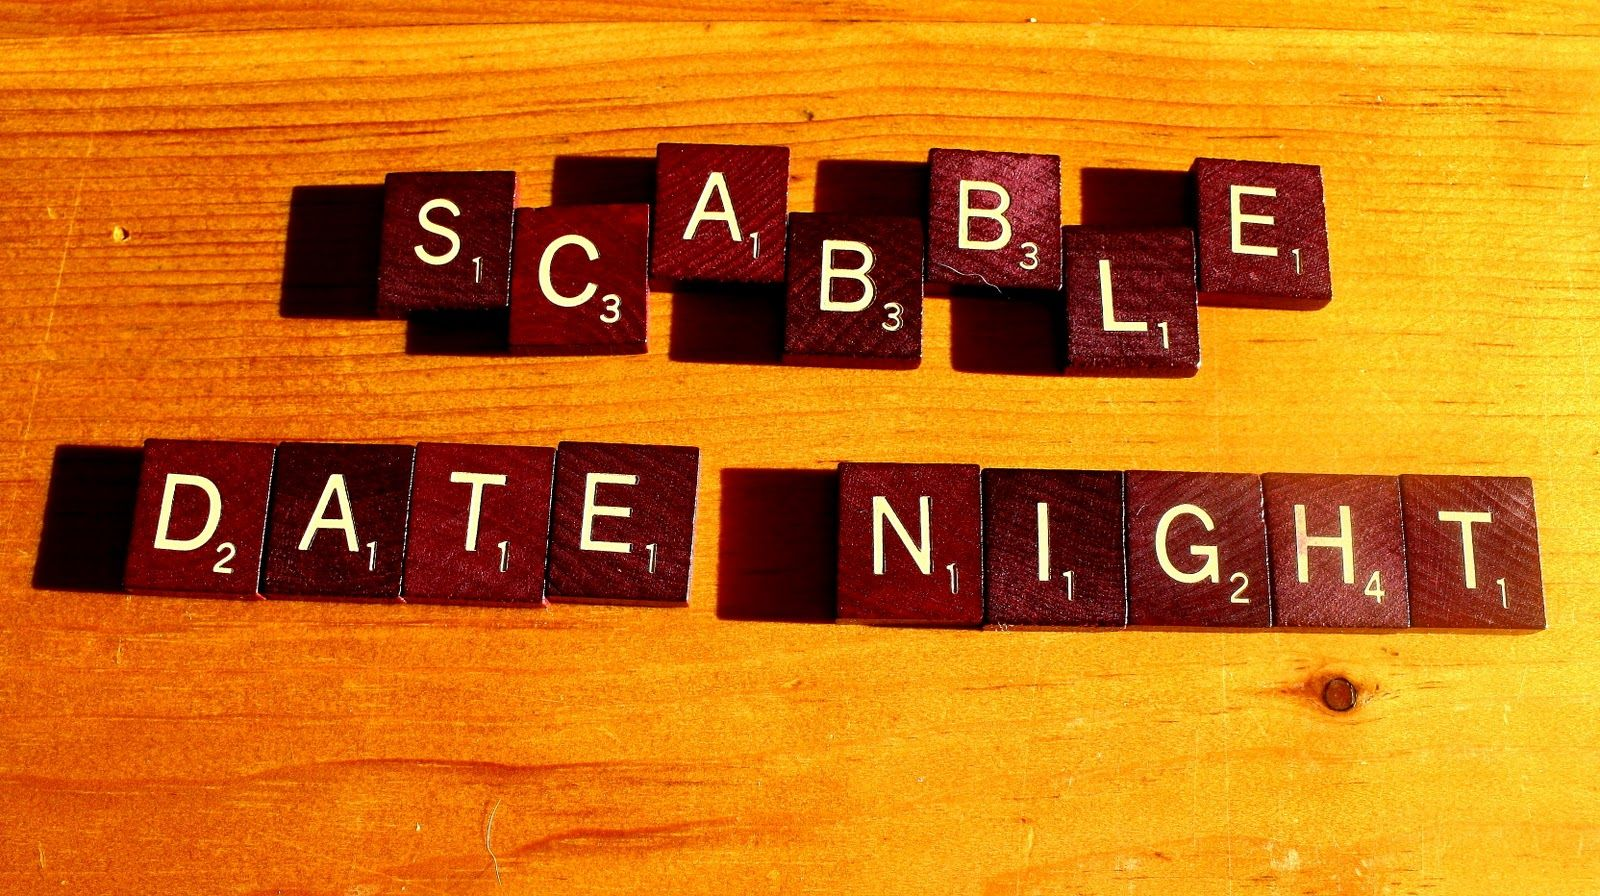 Dating Scrabble